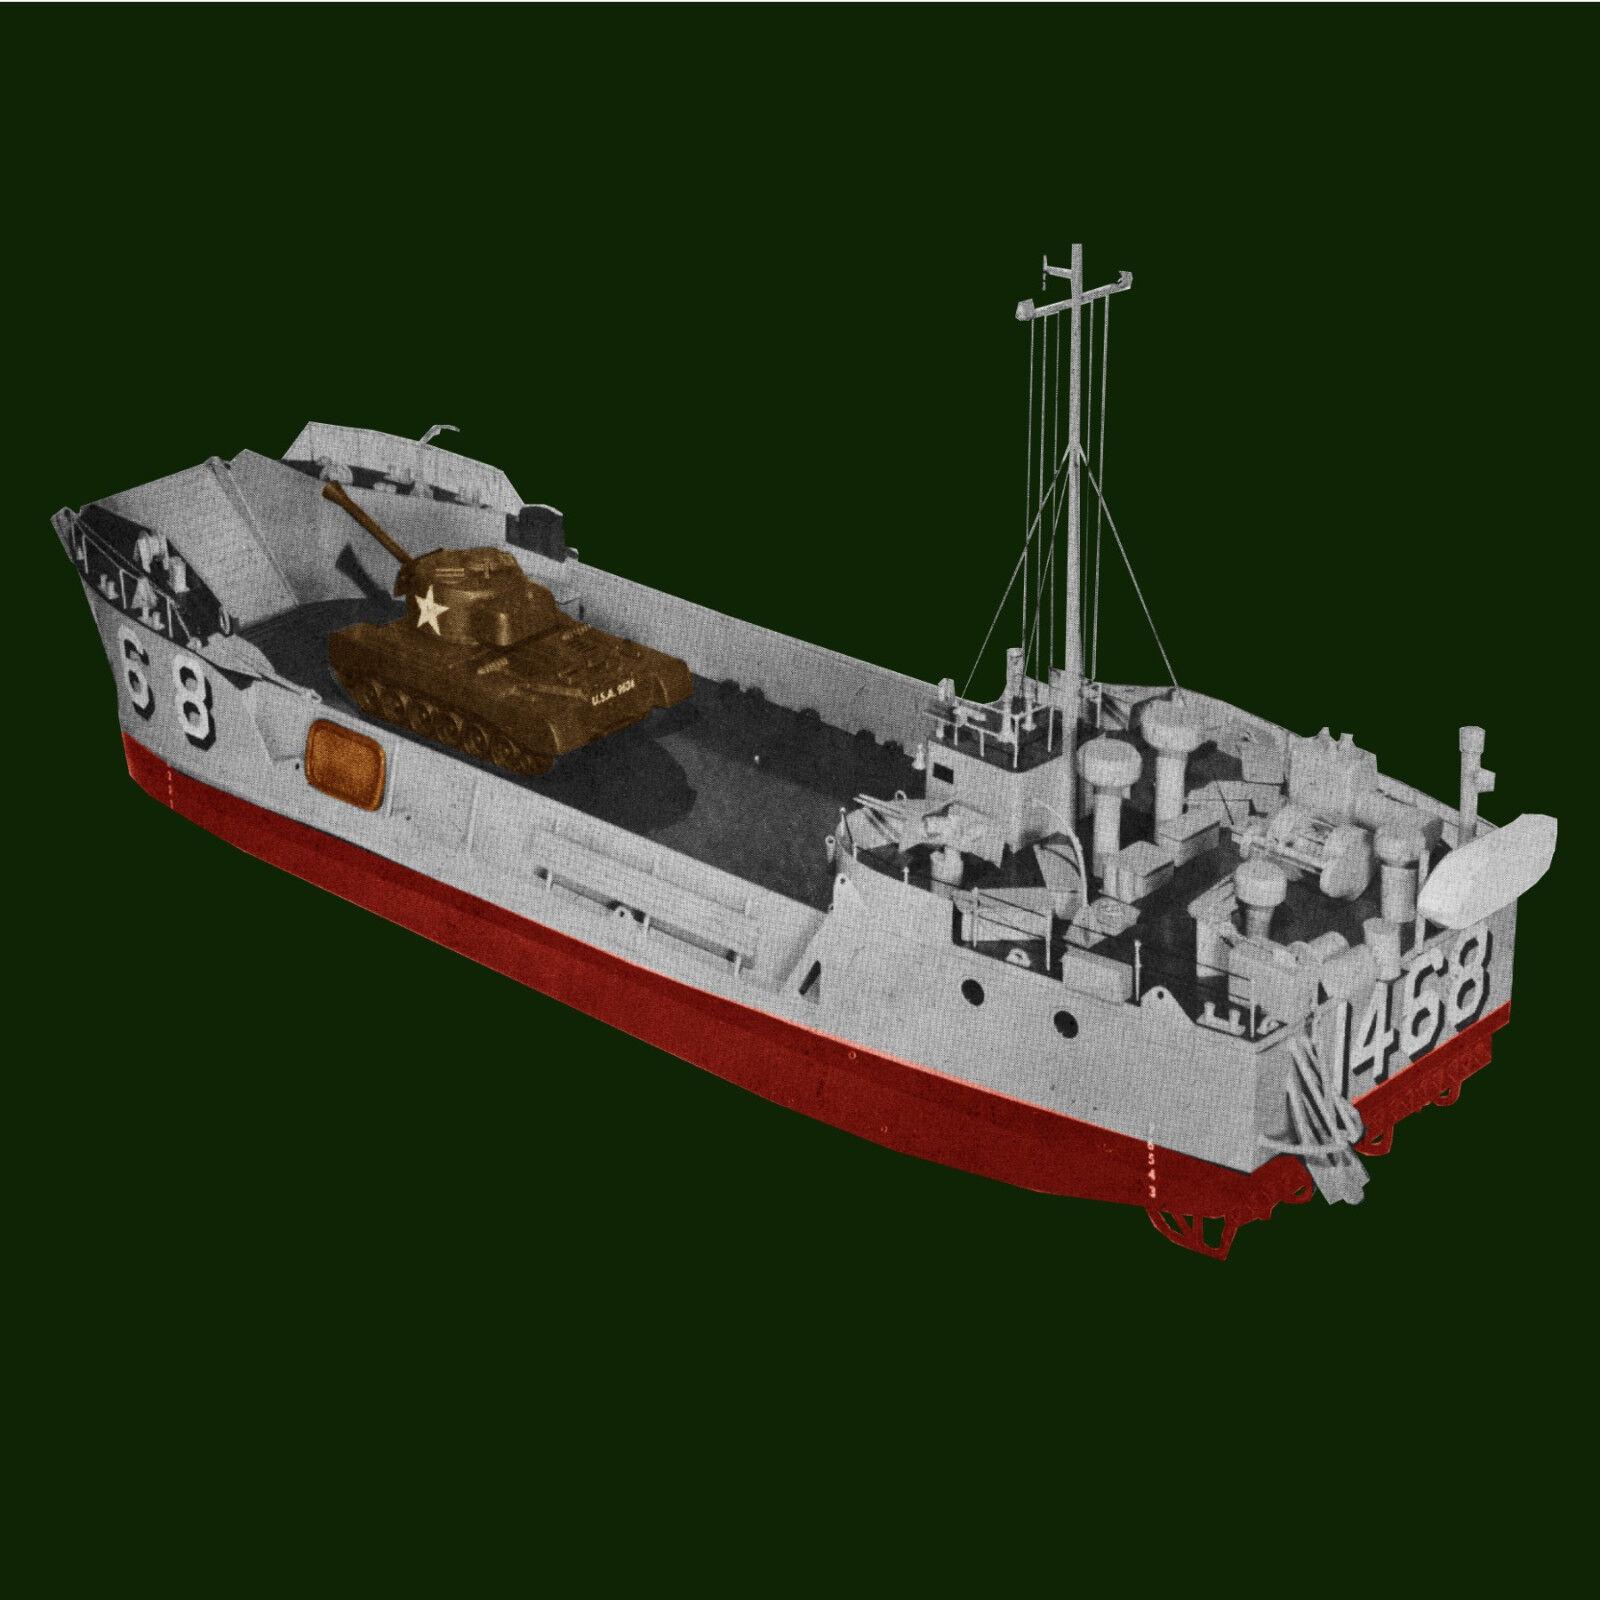 rc model boat plans free radio control model boat plans model lobster ...